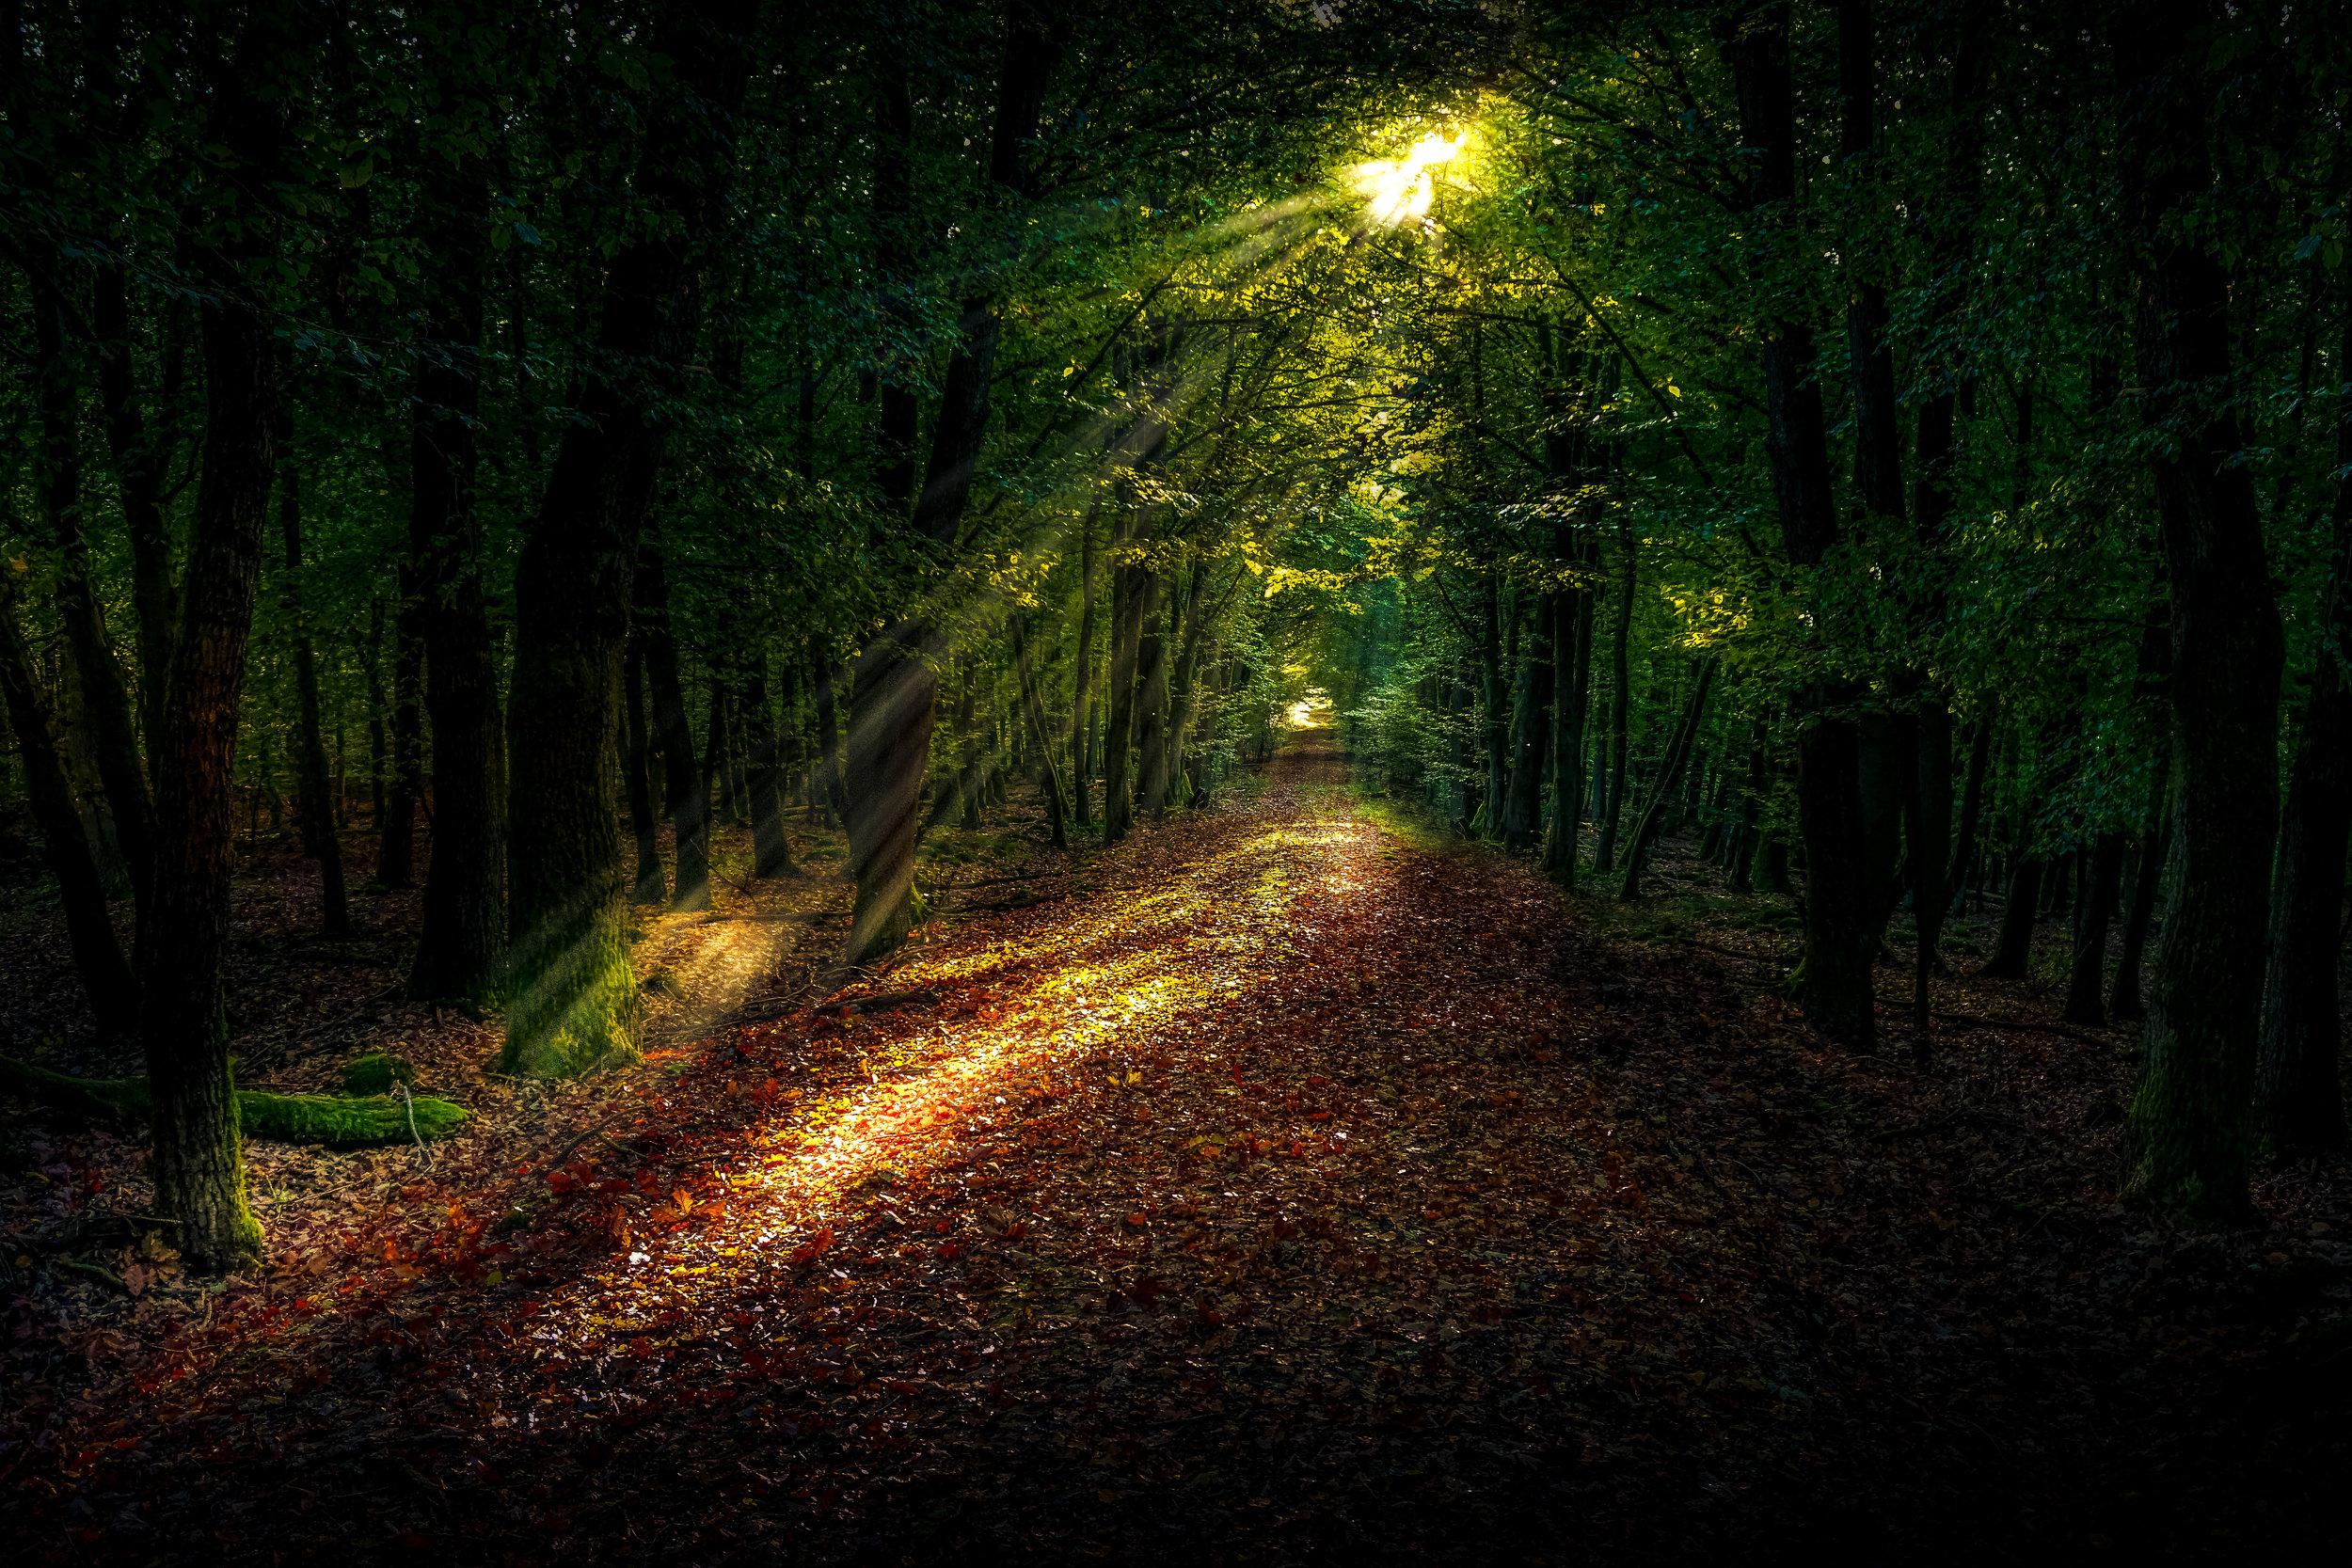 landscape-tree-nature-forest-path-grass-1417529-pxhere.com.jpg